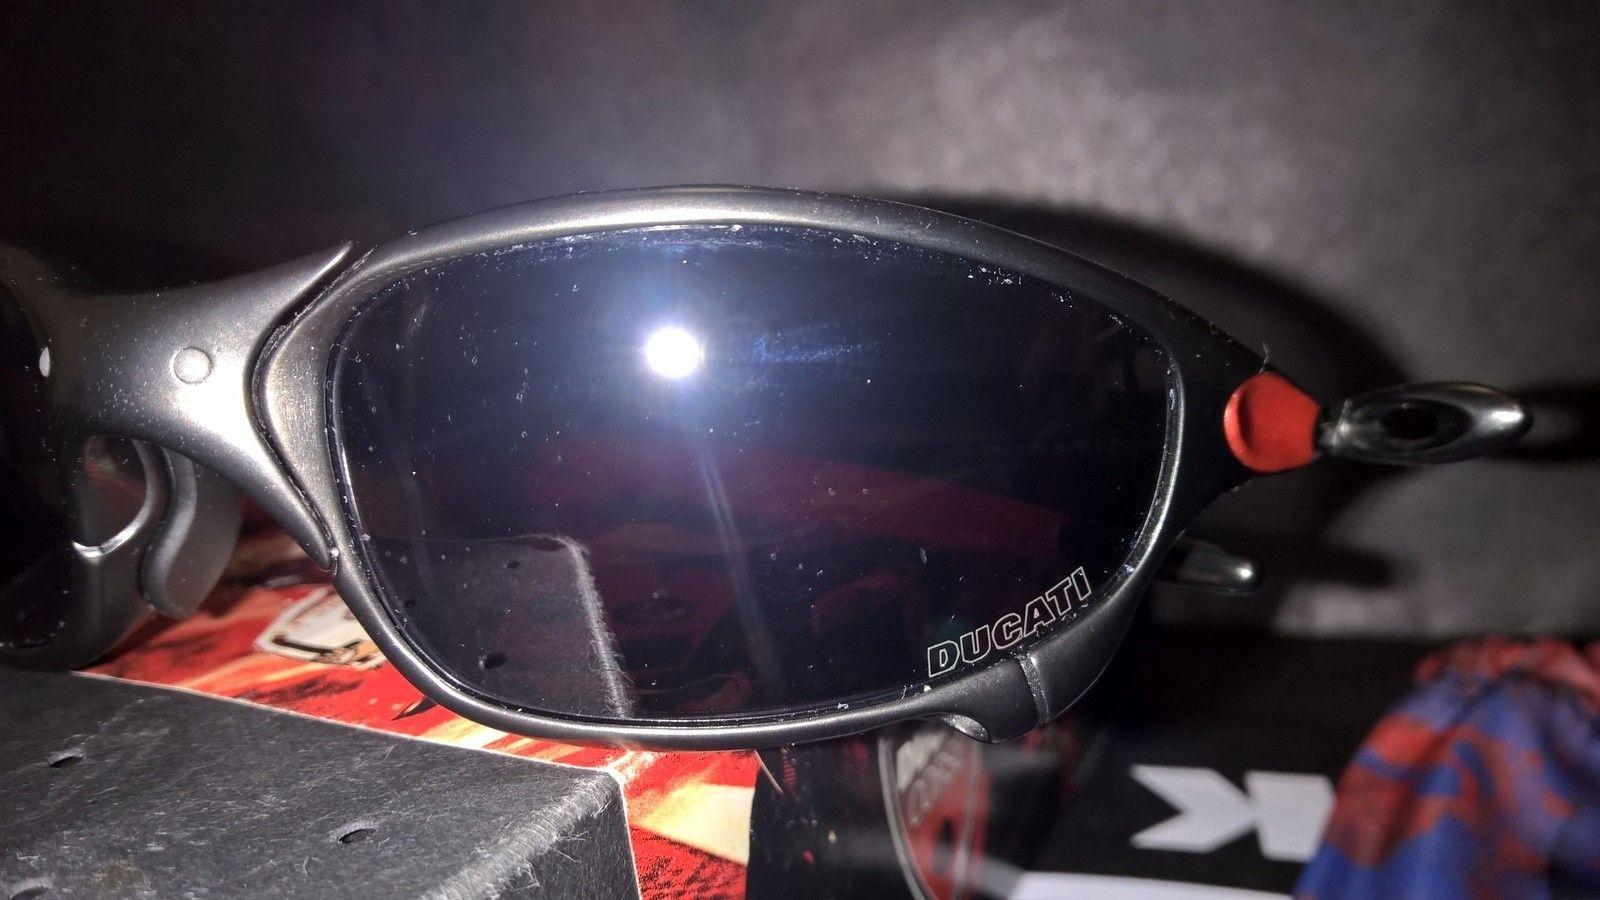 Ti Gold Romeo 1 / Ducati Juliet / Ti Ice Penny / X Metal XX / Ti VR28 Penny - WP_20150323_19_35_08_Pro.jpg